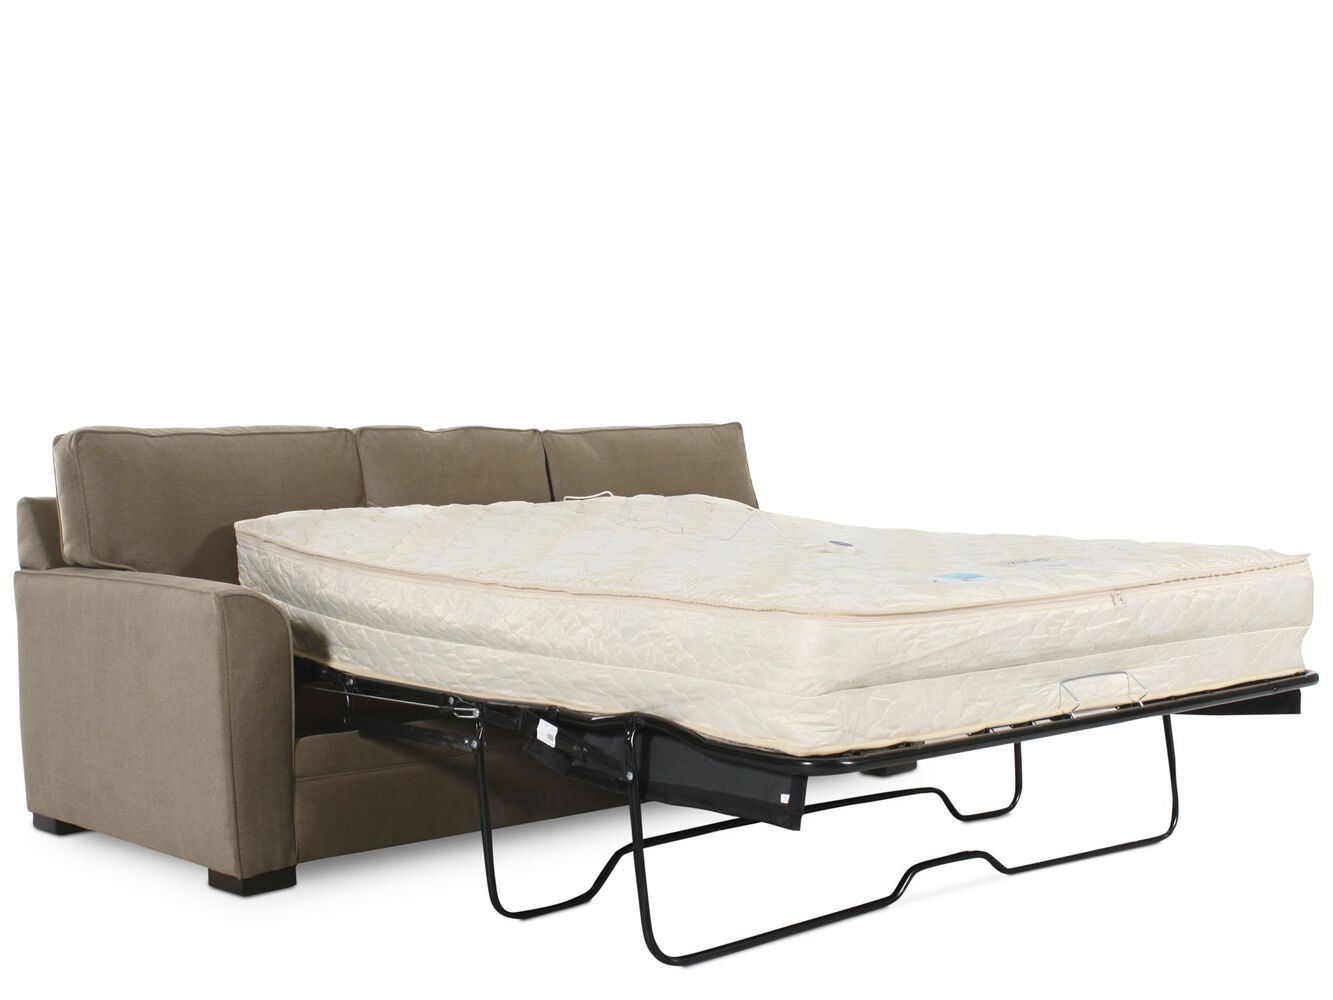 Jonathan Louis Queen Sleeper Sofa with Air Mattress ...